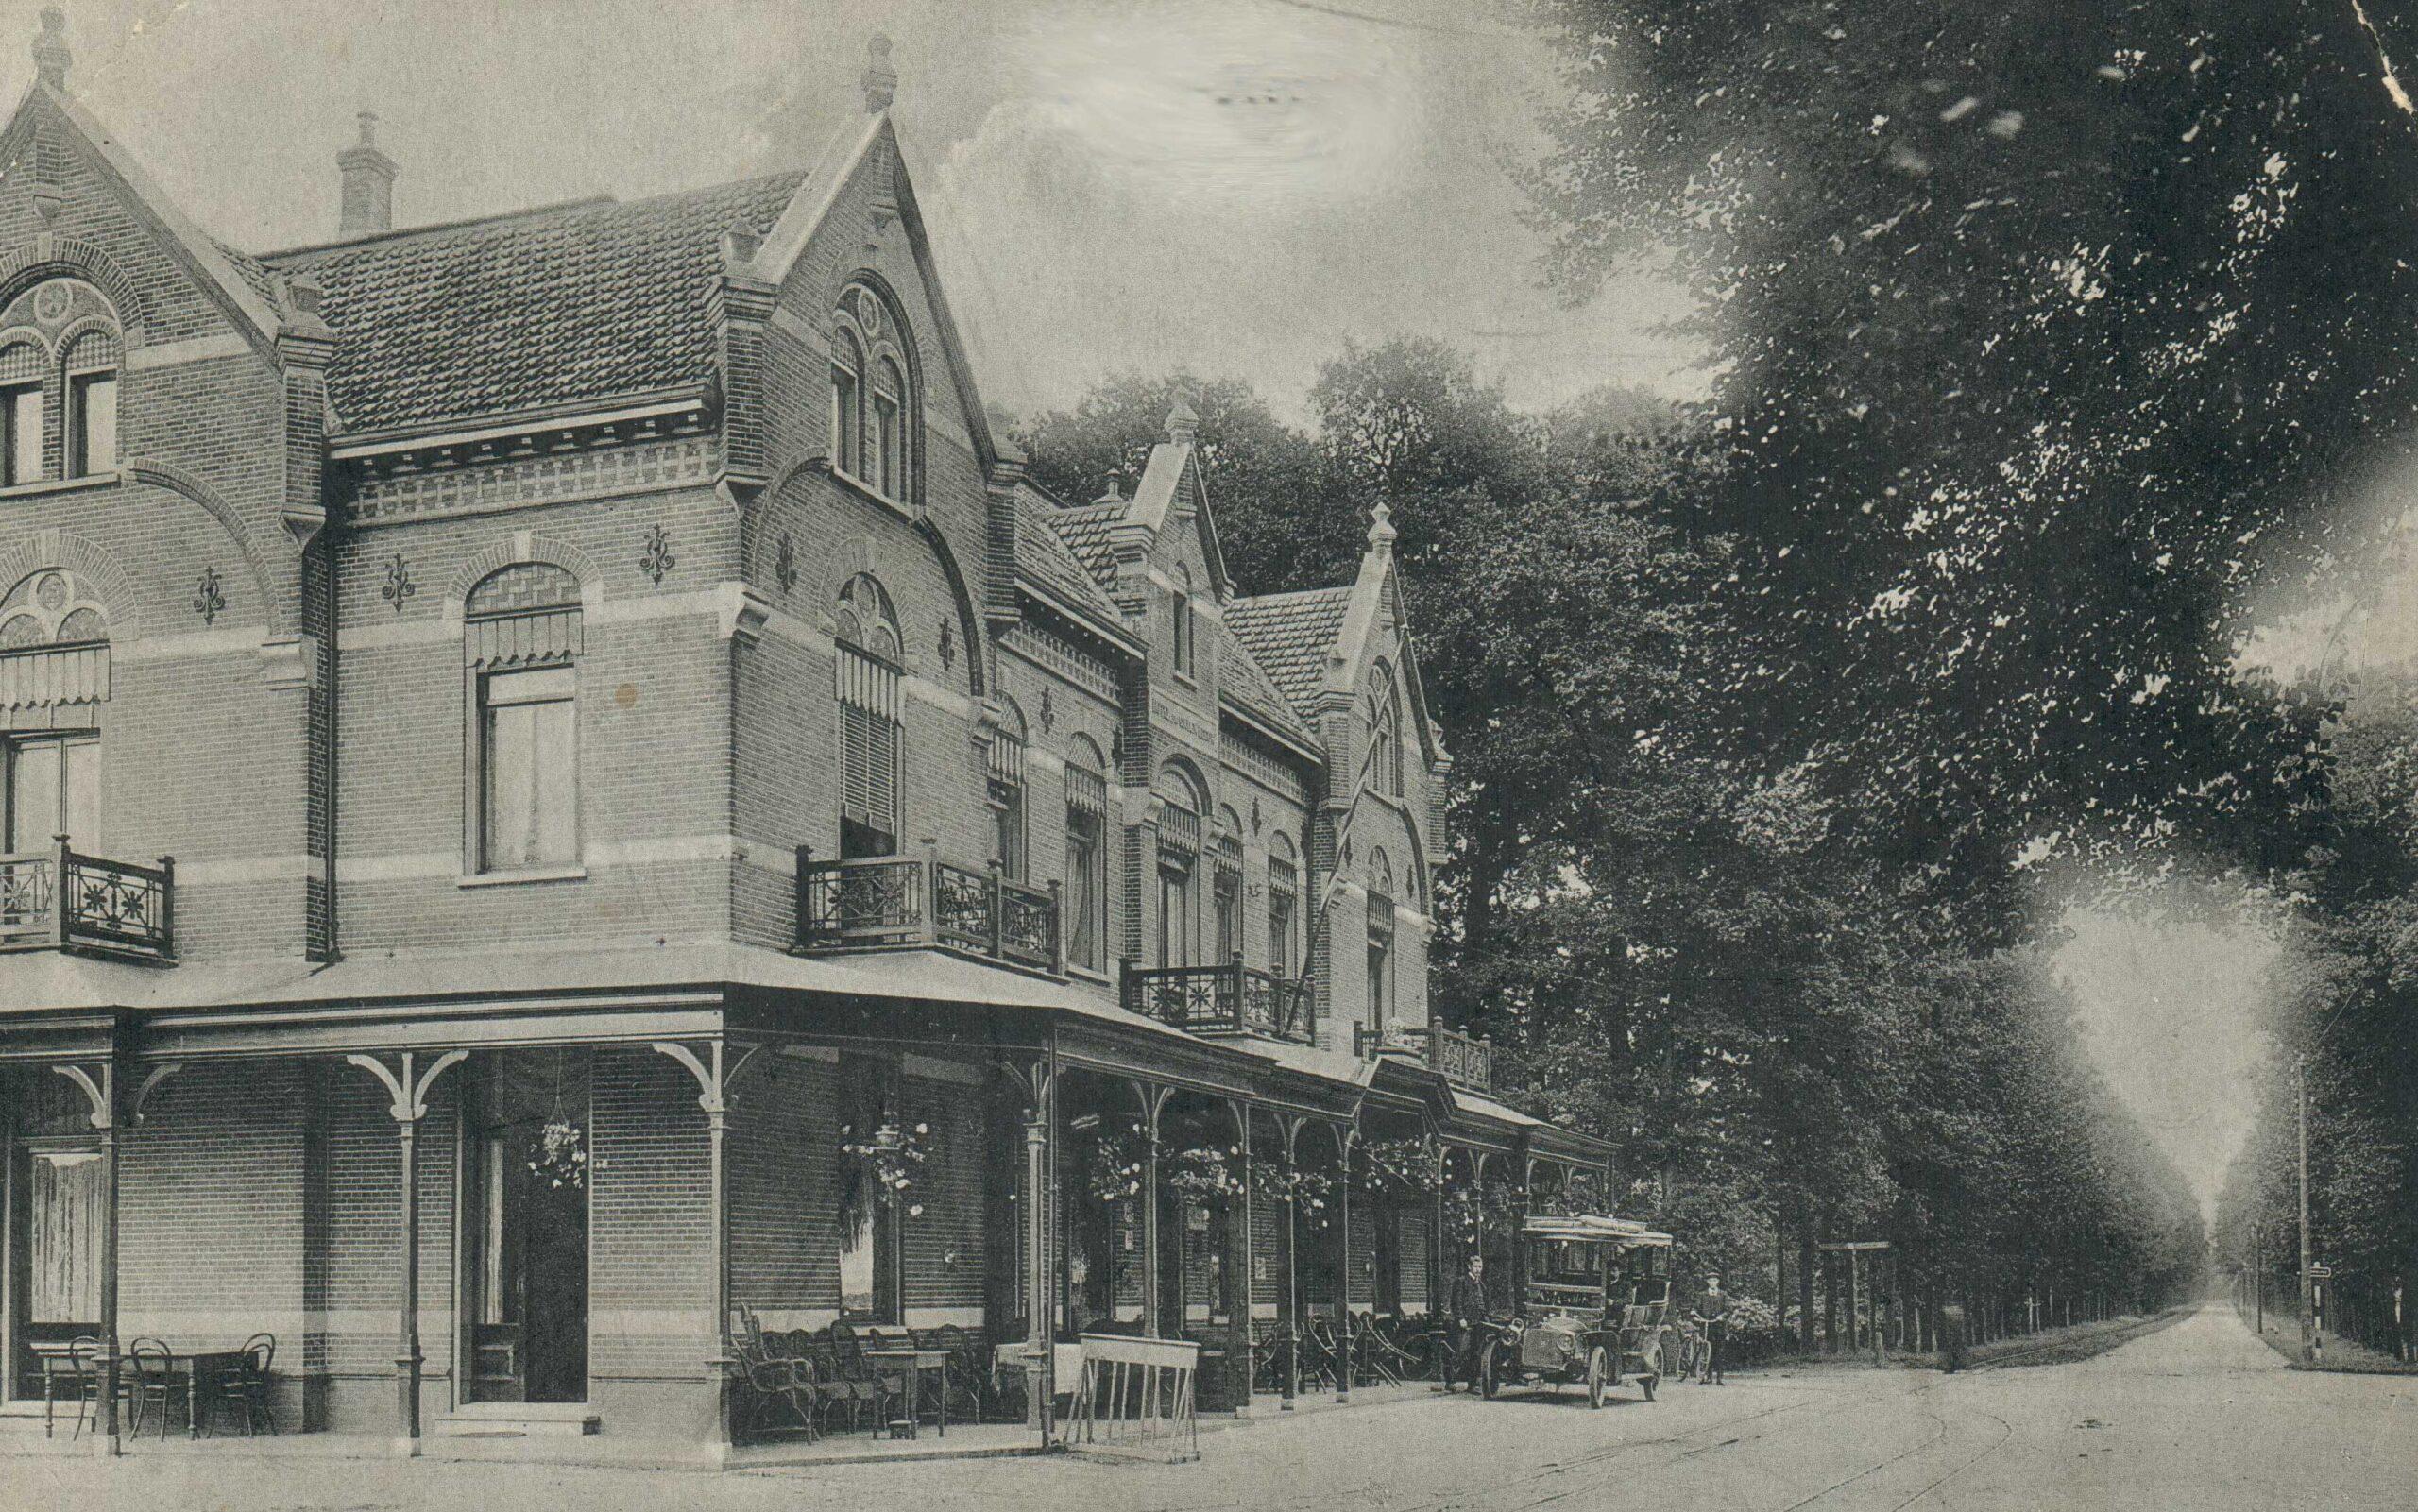 Laag-Keppel Rijksweg 91 Hotel de Gouden Leeuw